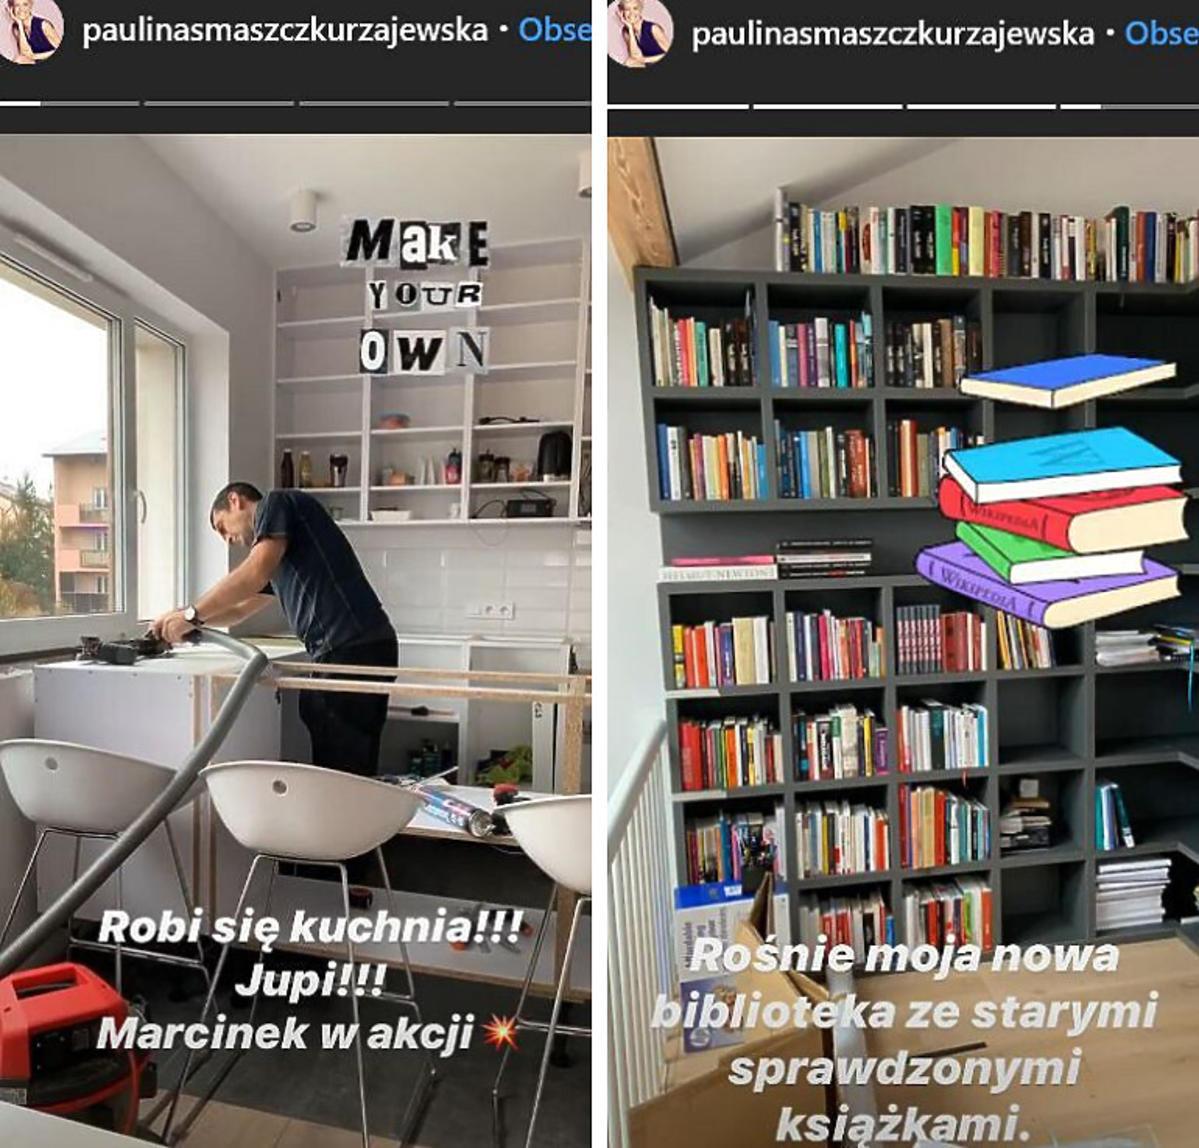 Jak mieszka Paulina Smaszcz-Kurzajewska?